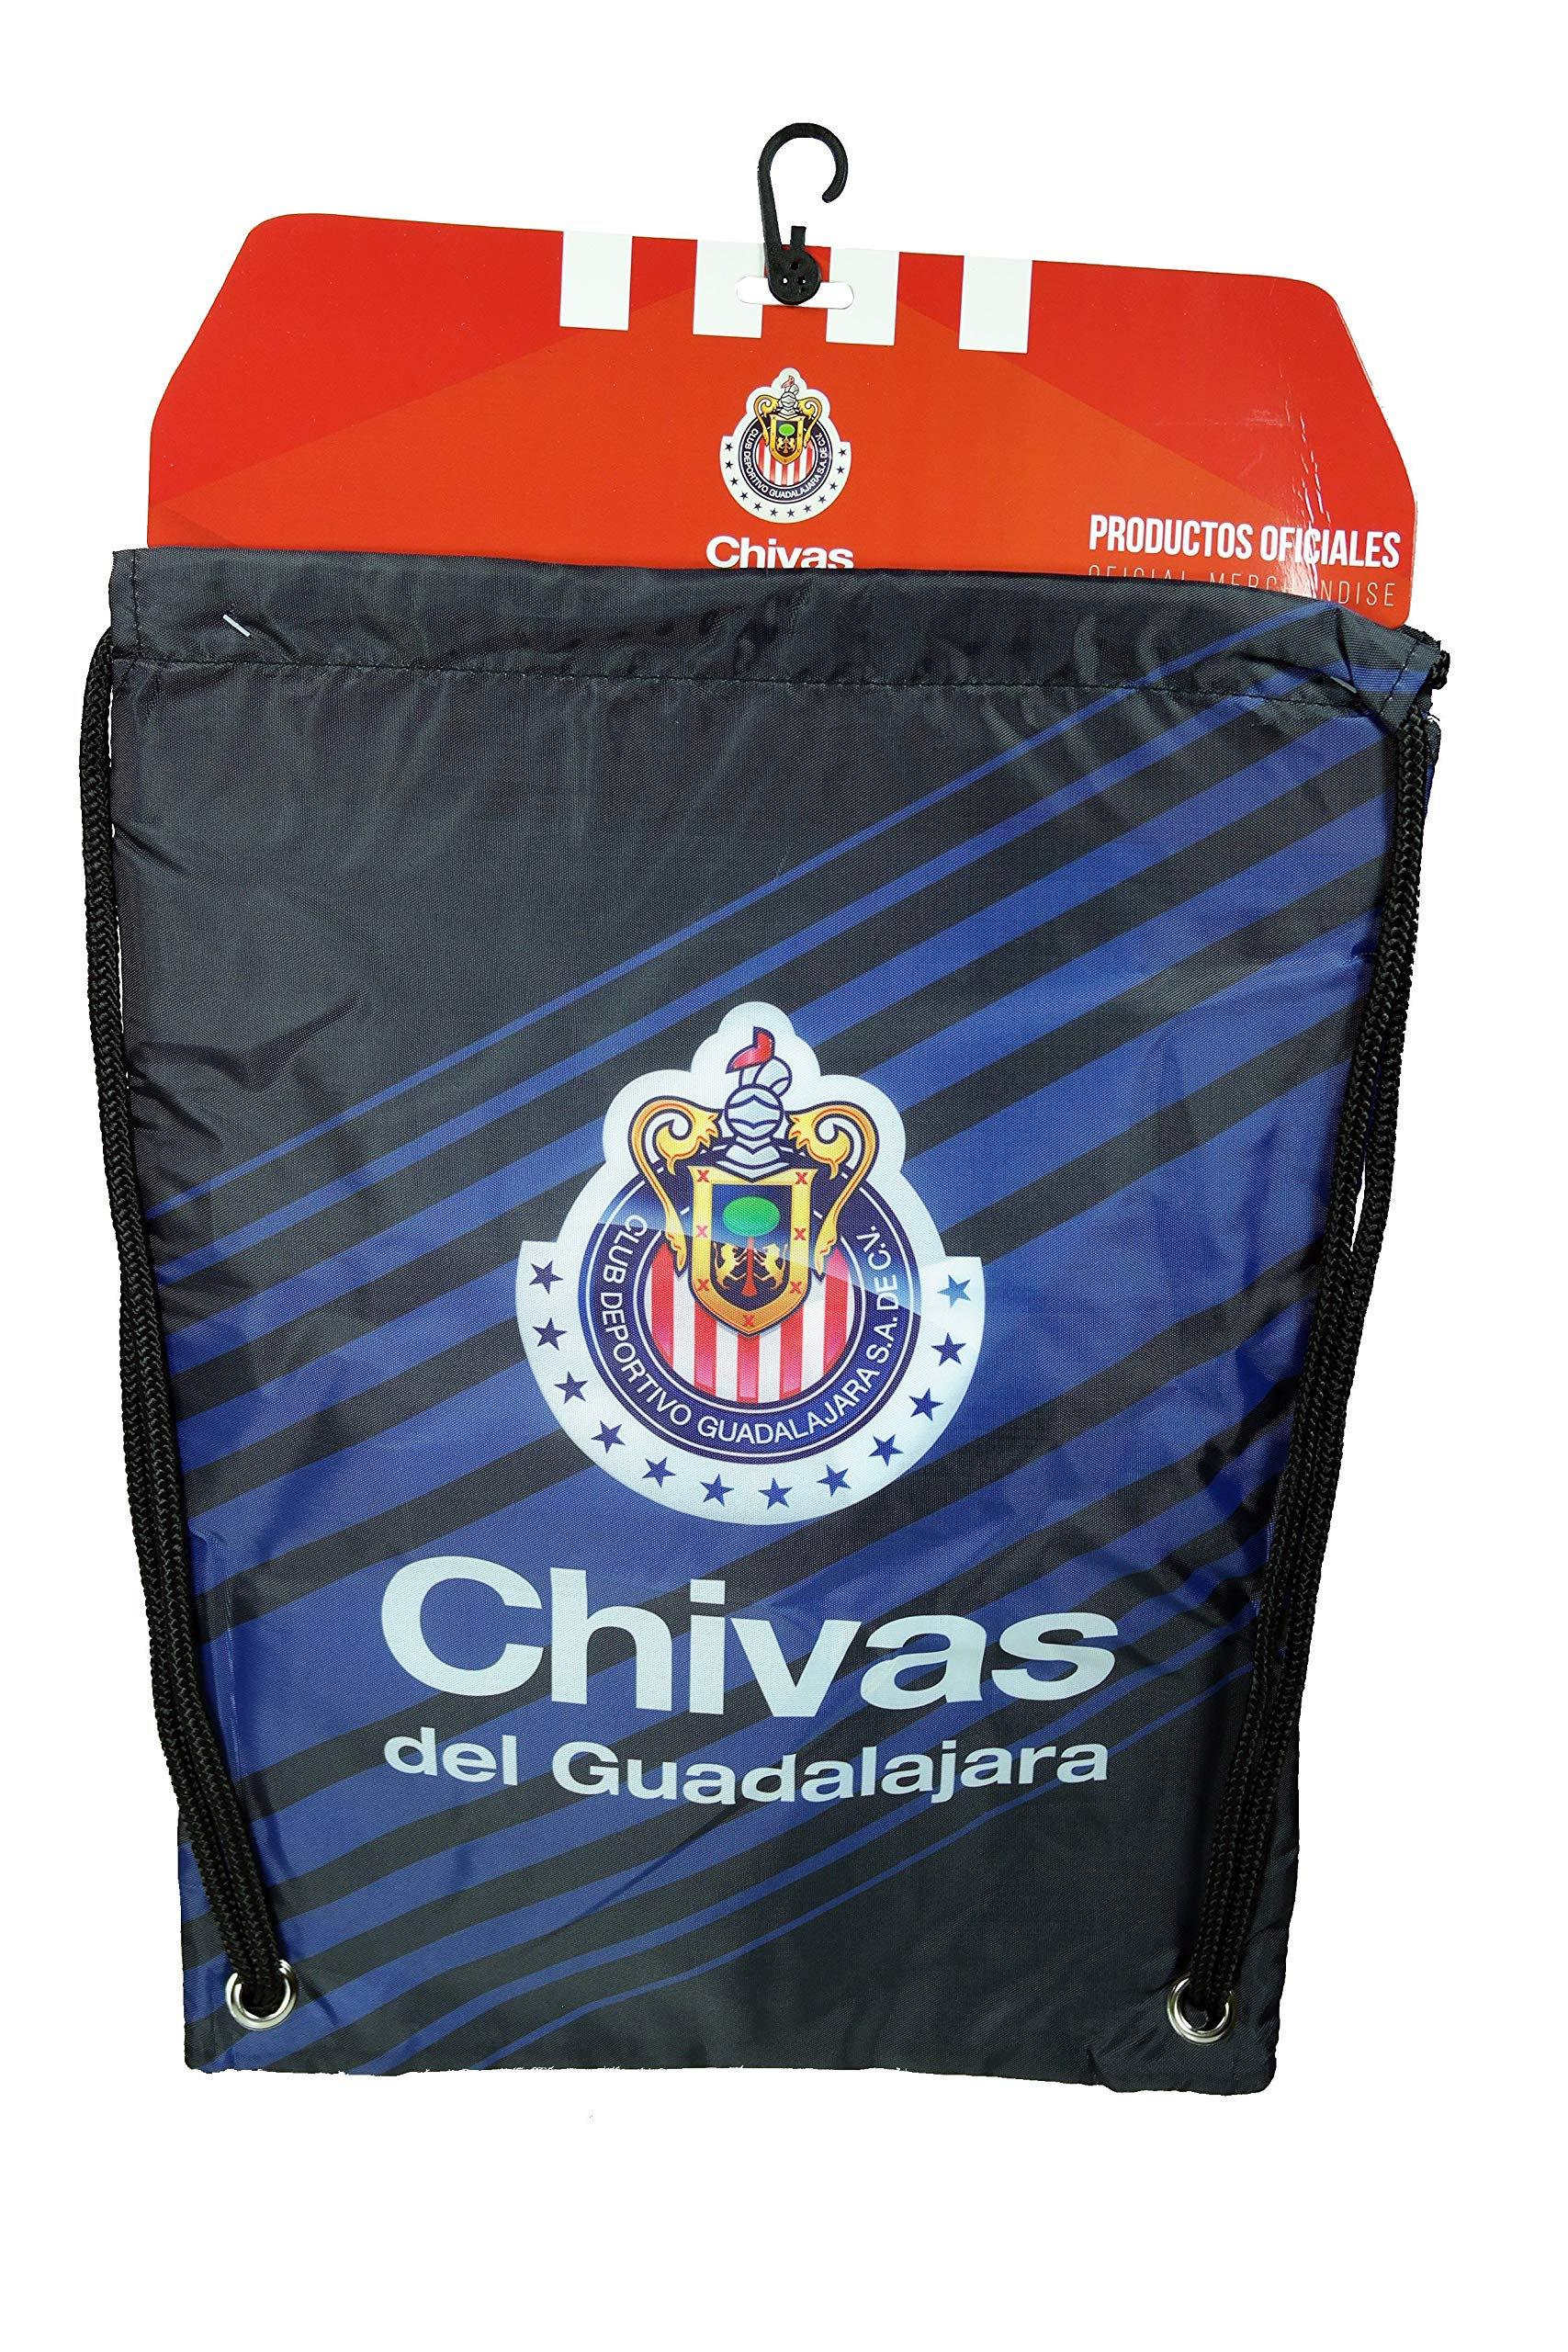 Chivas De Guadalajara Authentic Official Licensed Soccer Drawstring Cinch Sack Bag 03-3